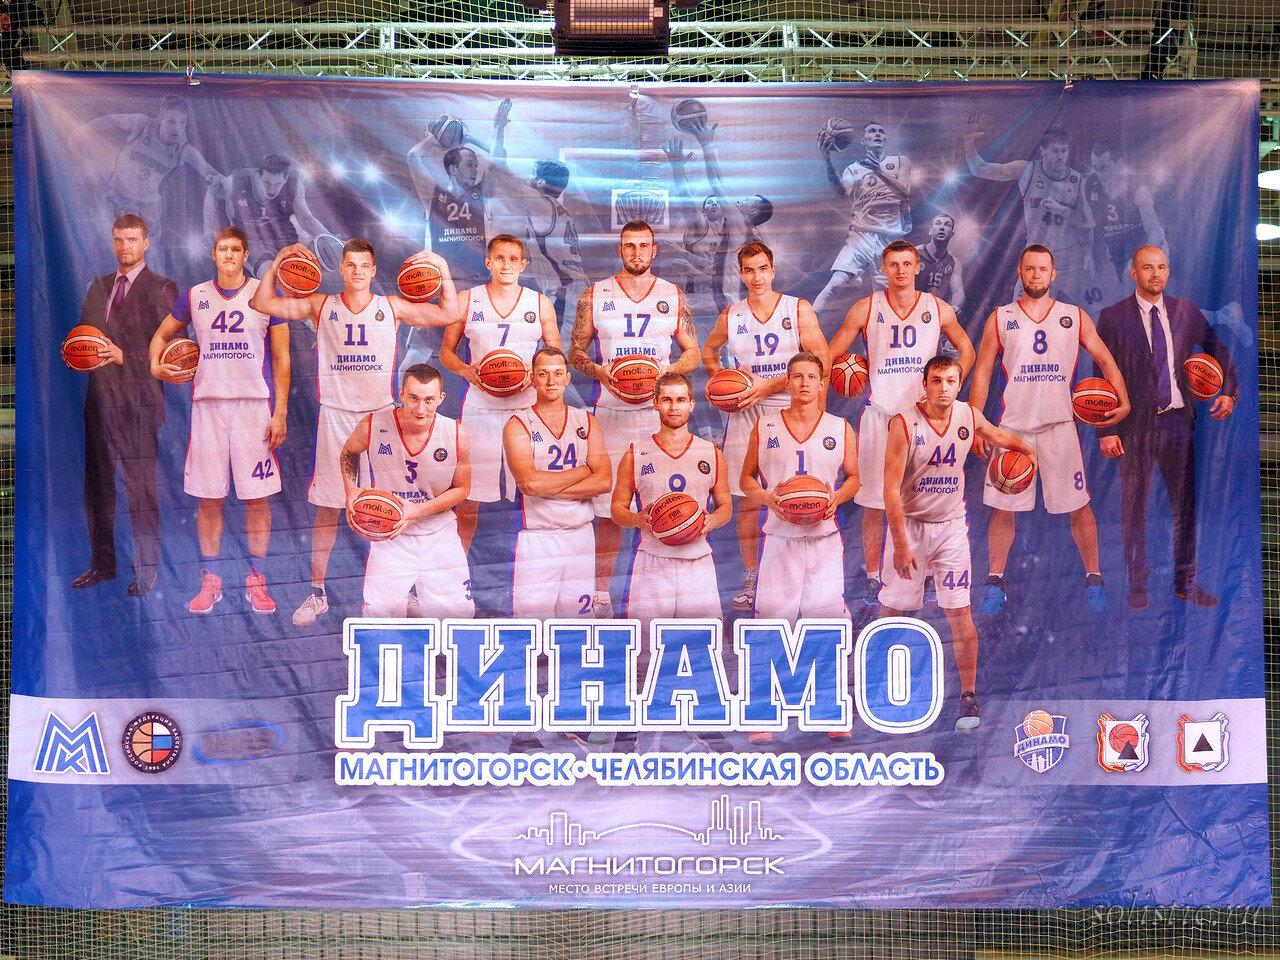 35 Динамо Магнитогорск - Нефтехимик 25.01.2018